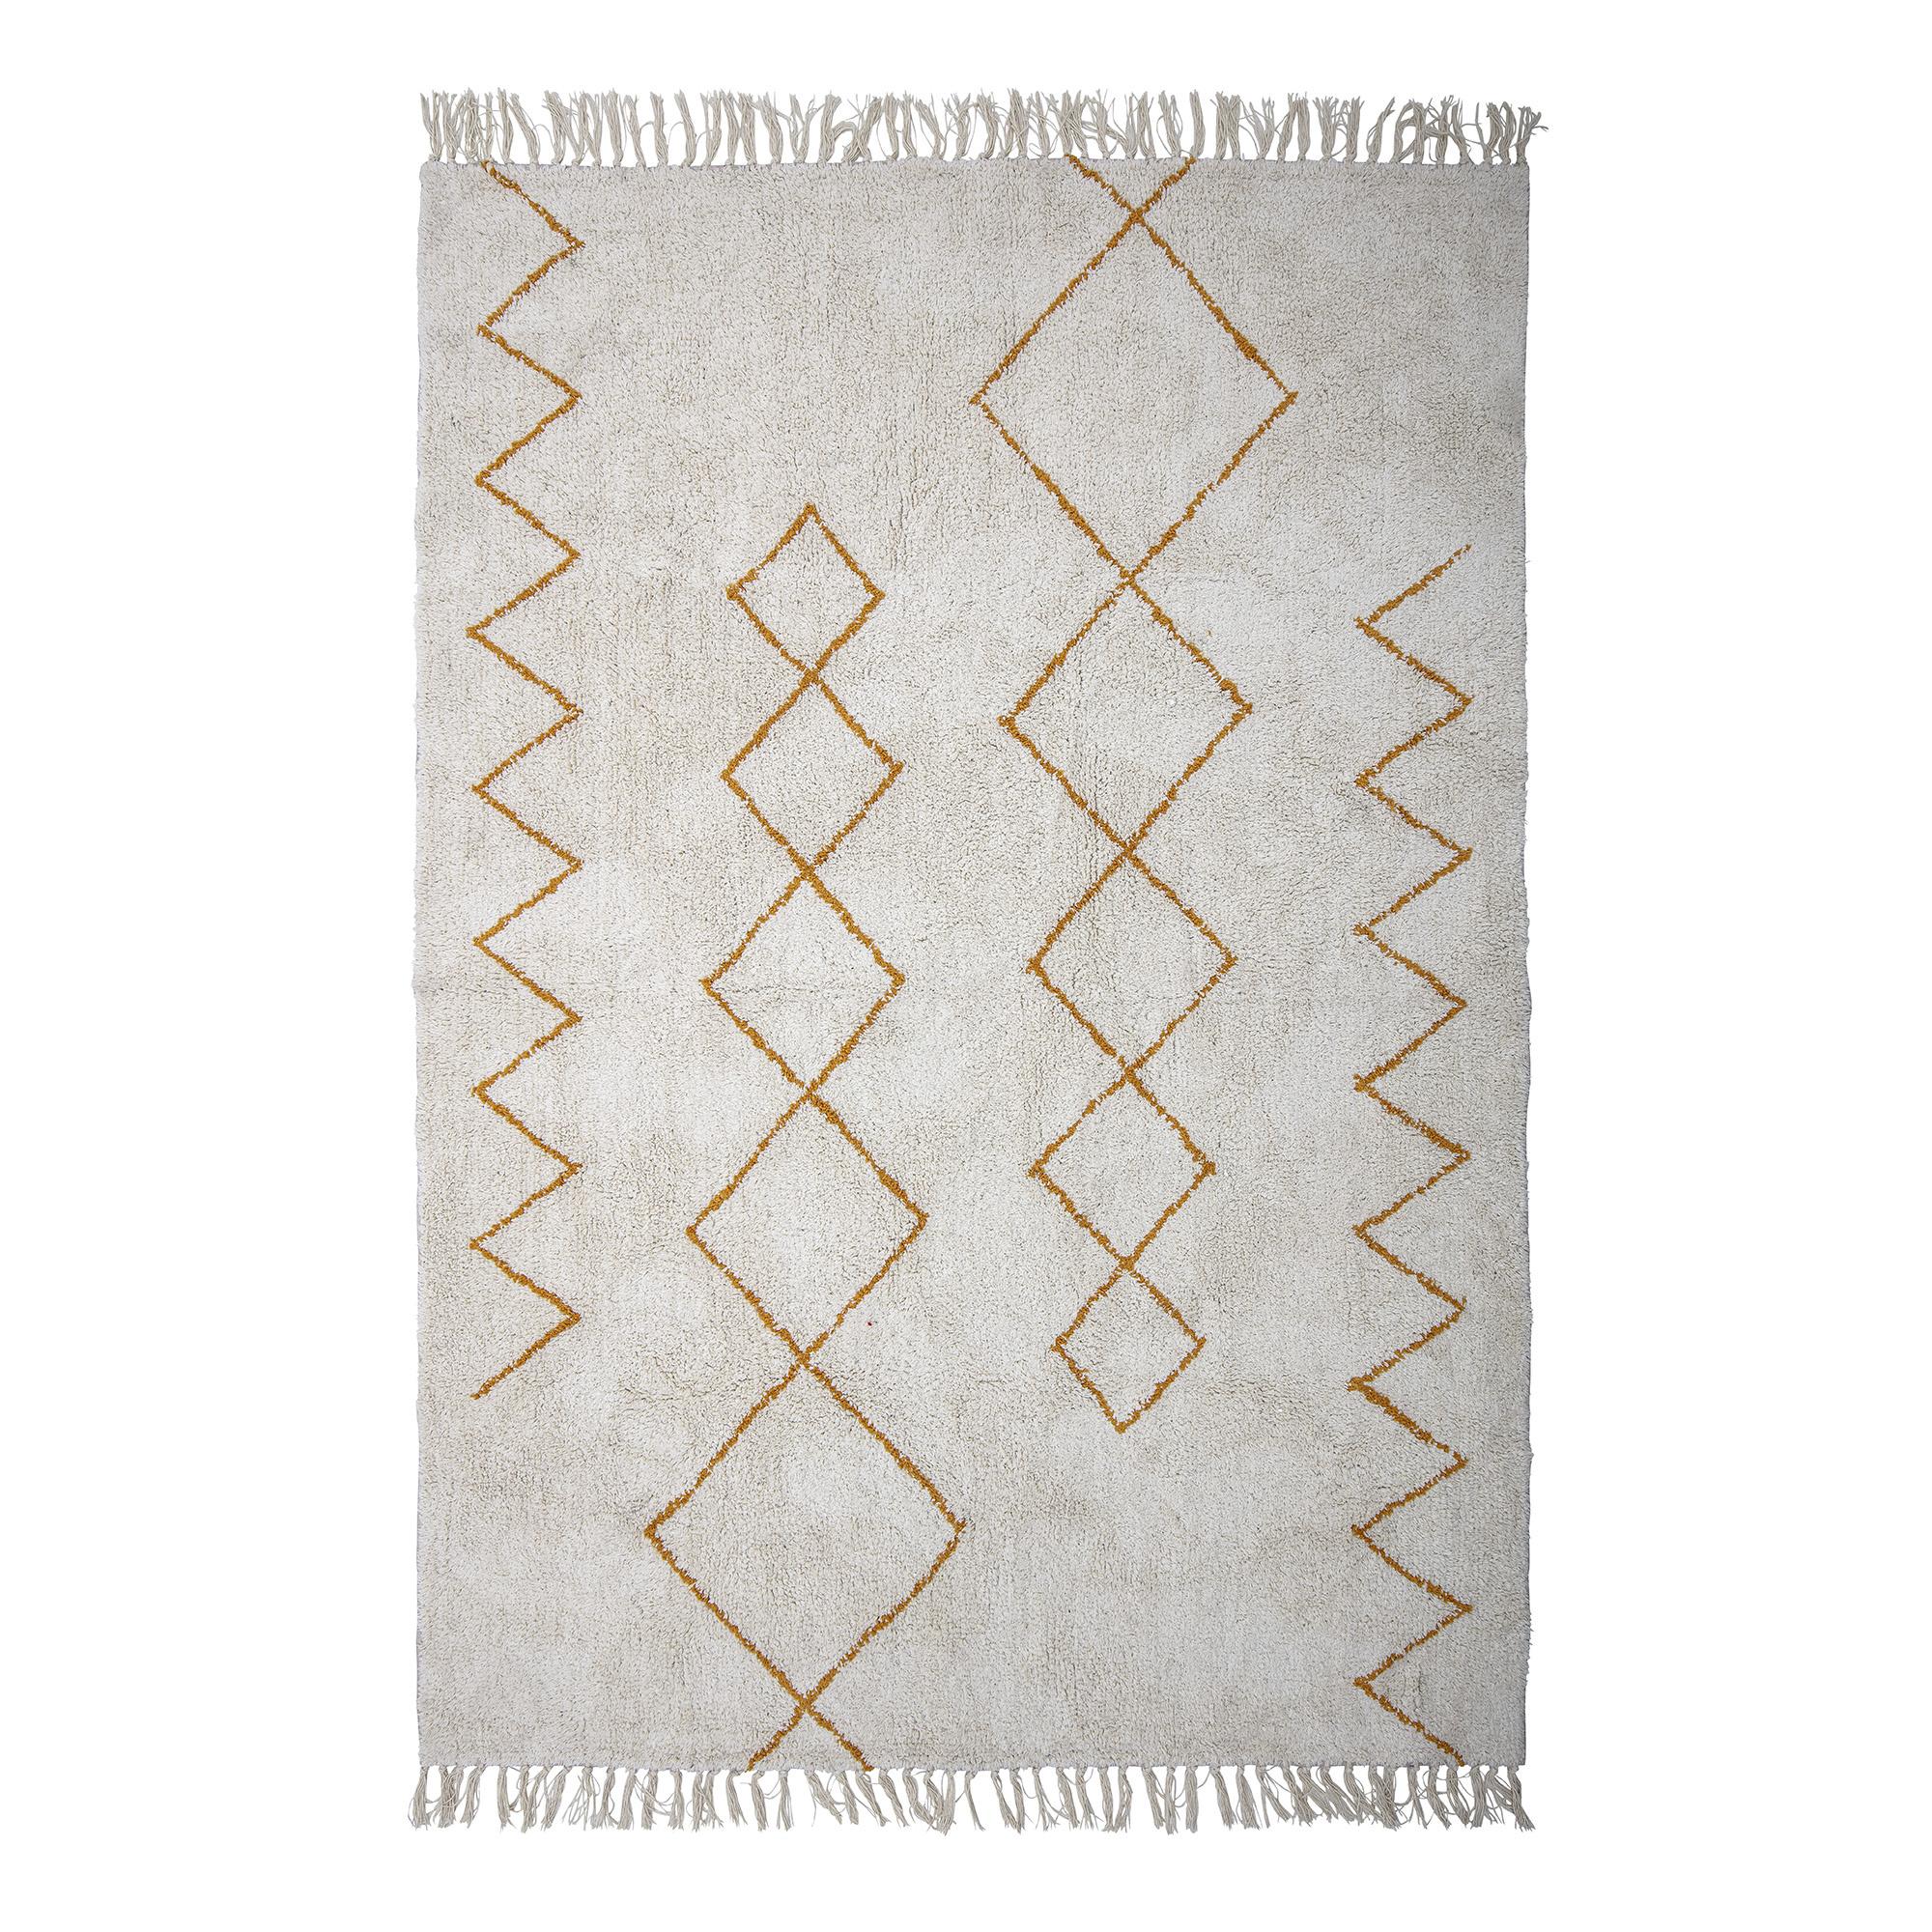 Bloomingville Tapis Scandinave en coton - blanc - 200x140cm - Bloomingville